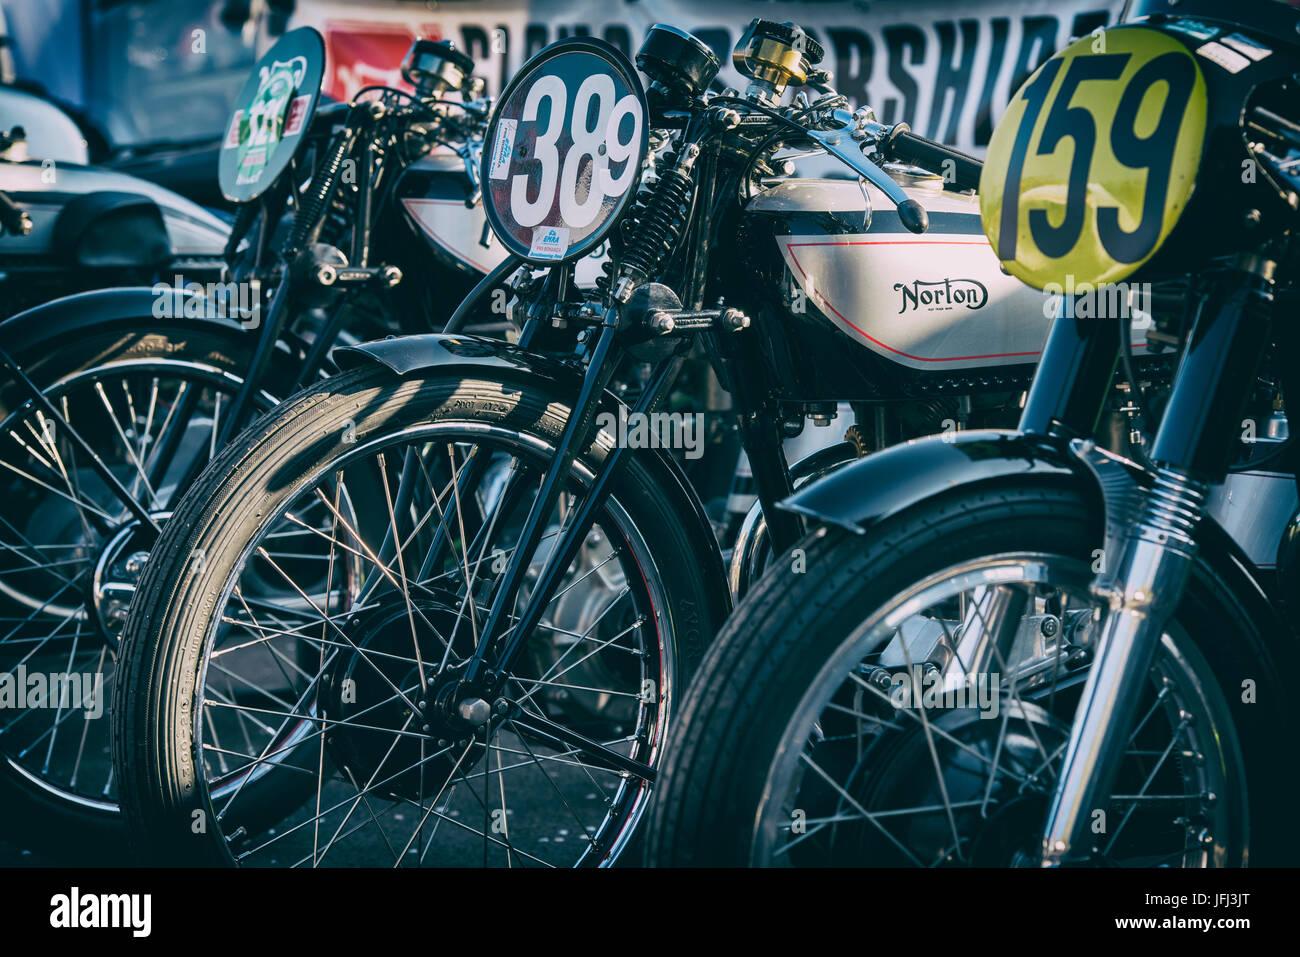 Vintage pre war Norton motorcycles. Classic british motorcycle. Applied retro filter - Stock Image